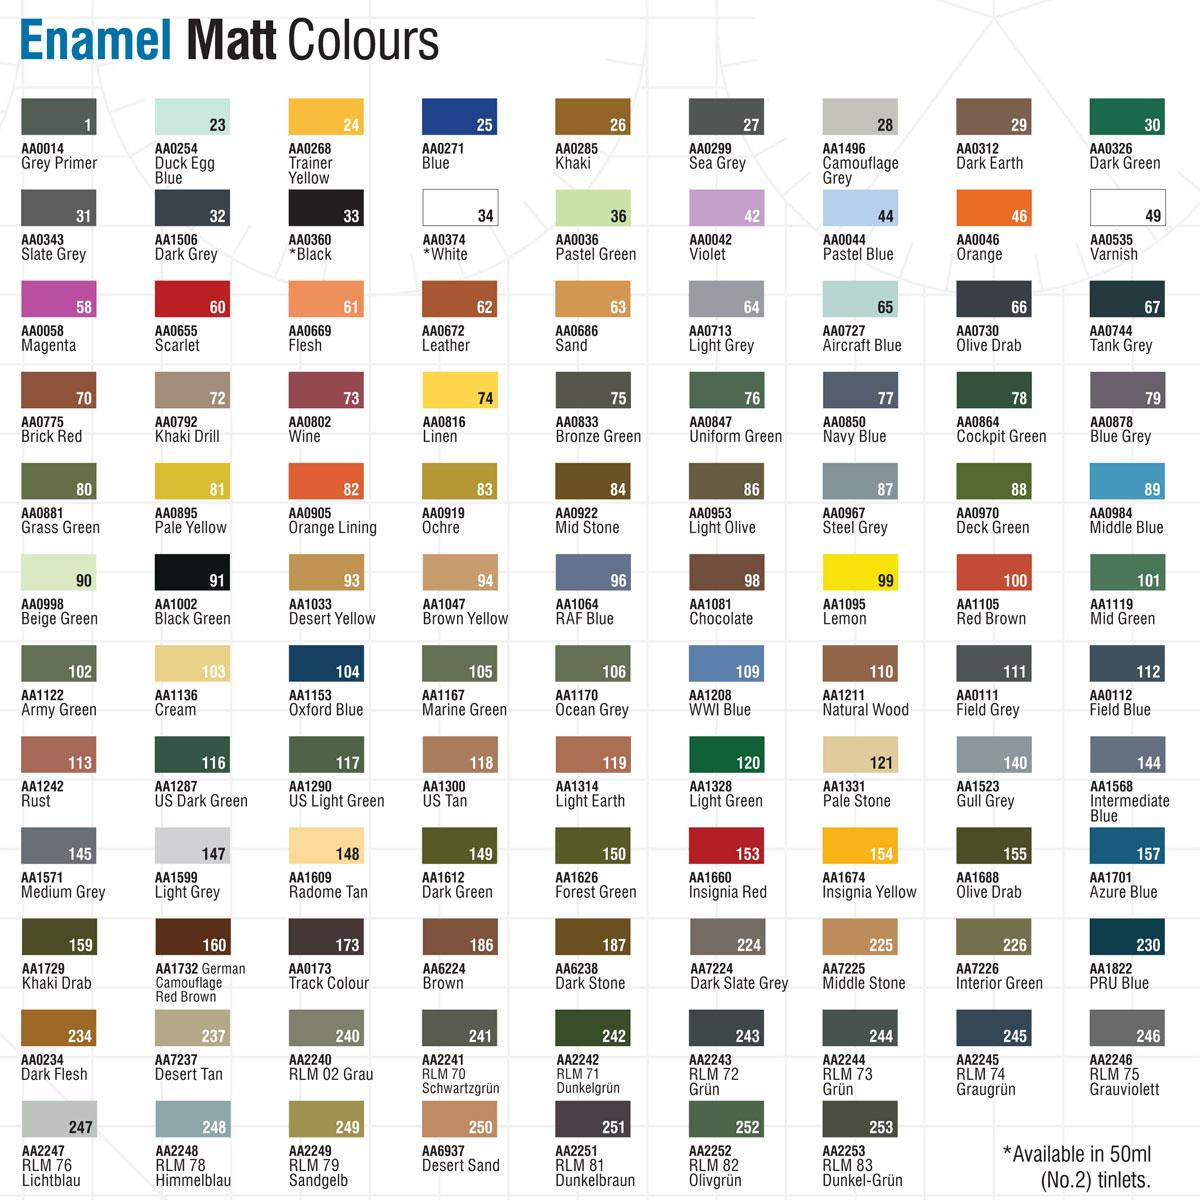 humbrol paint chart: Humbrol enamel modelling paint tinlets colour chart